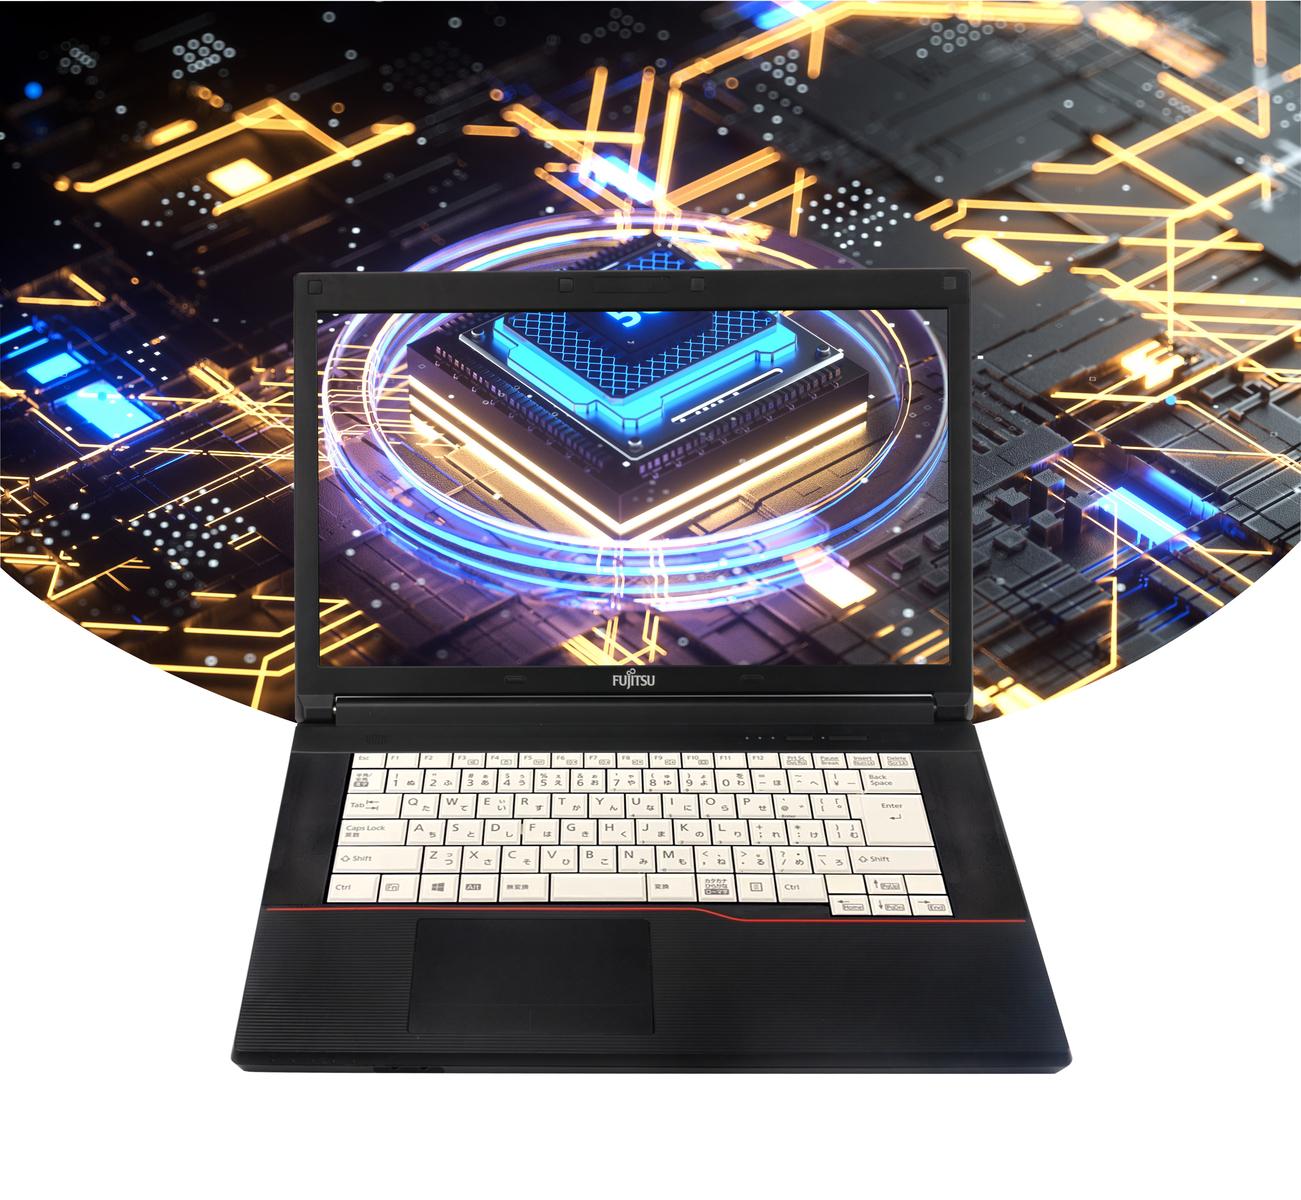 【中古】【Win i5/メモリ4GB/新品SSD240GB/15.6インチ液晶/DVD/無線LAN付/中古ノートパソコン(外付きテンキー、新品メモリー+新品SSD選択可能)WPS OFFICE /第3世代Core A573/HX 10搭載】【OFFICE搭載】富士通